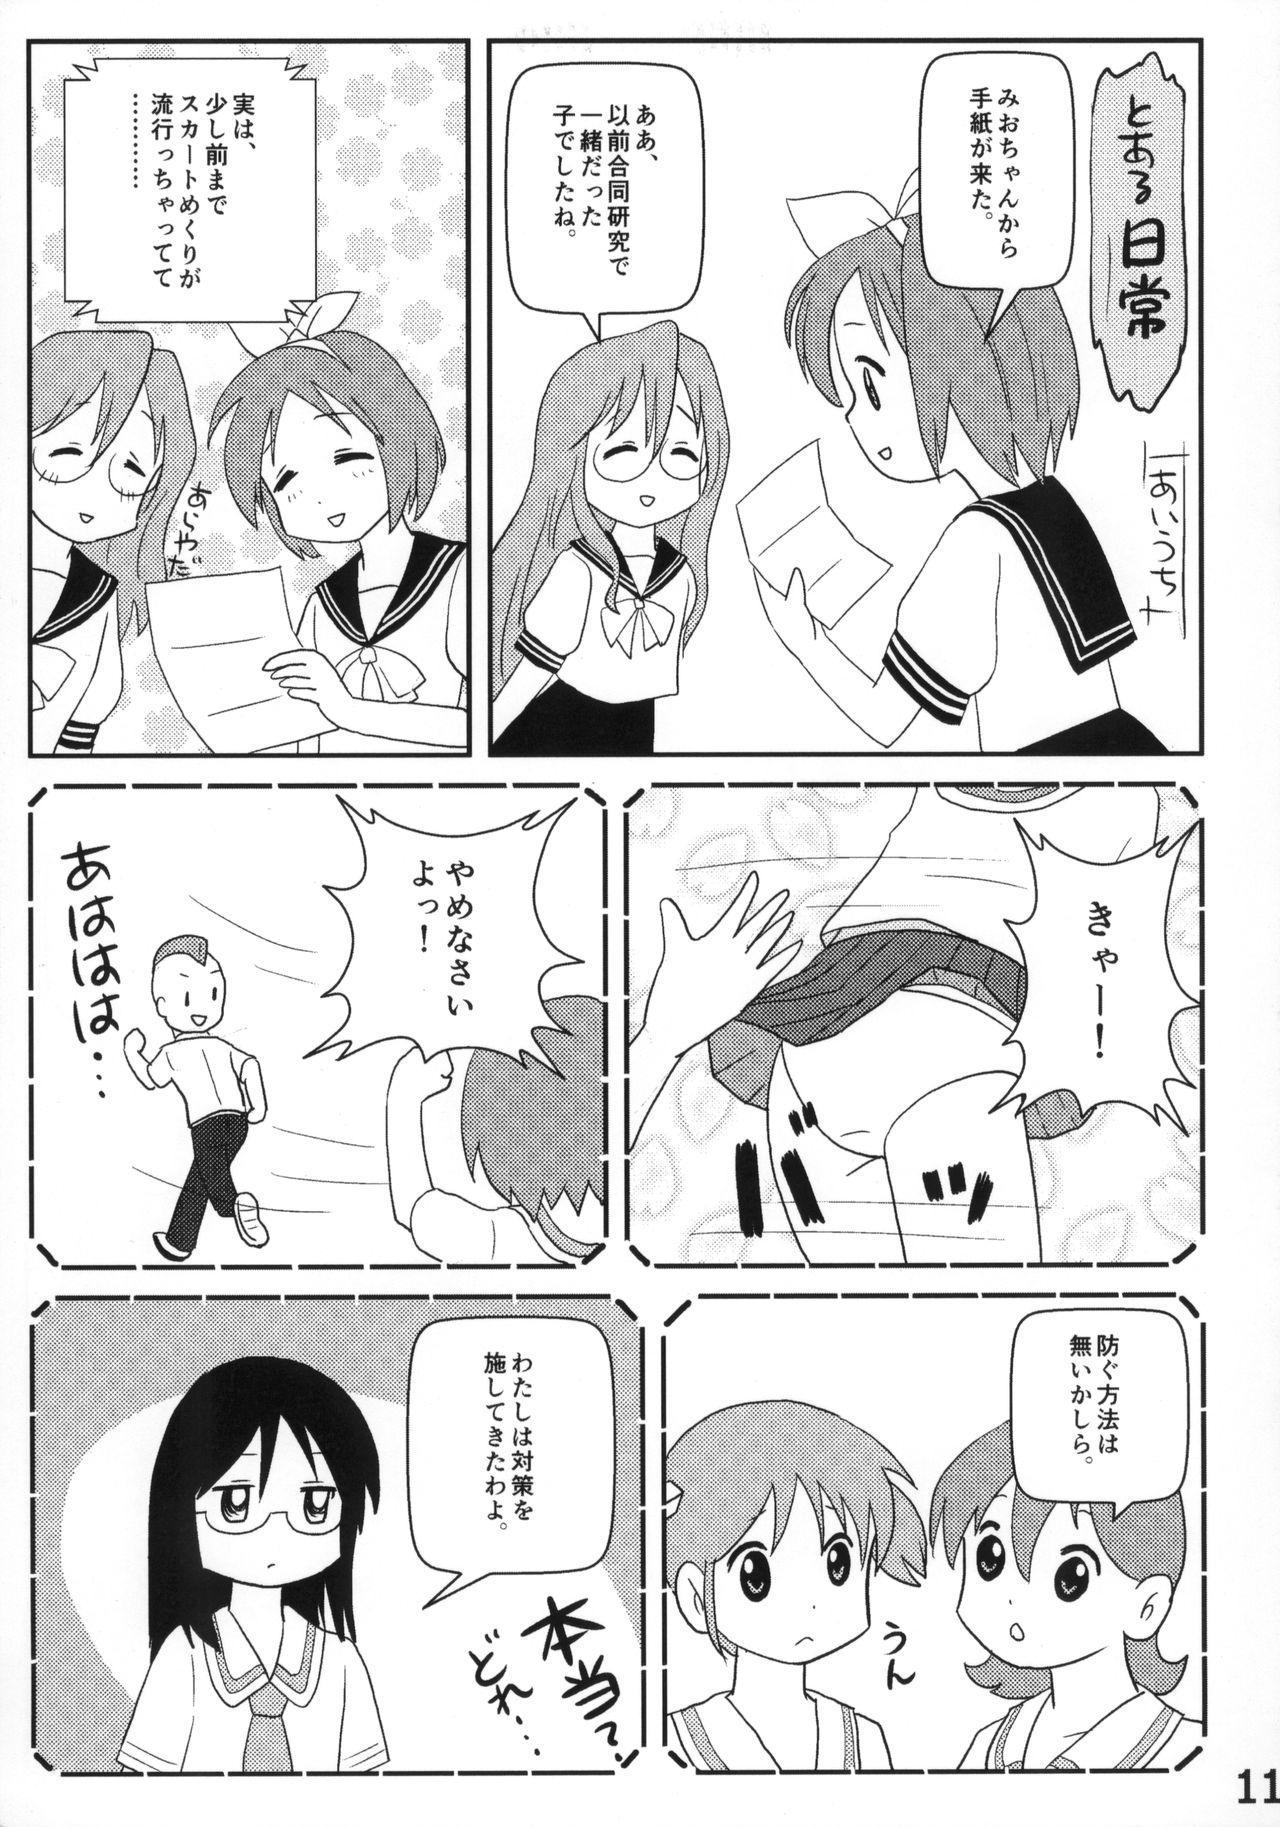 Lucky-jou Pantsu Hunter Vol. 2 9